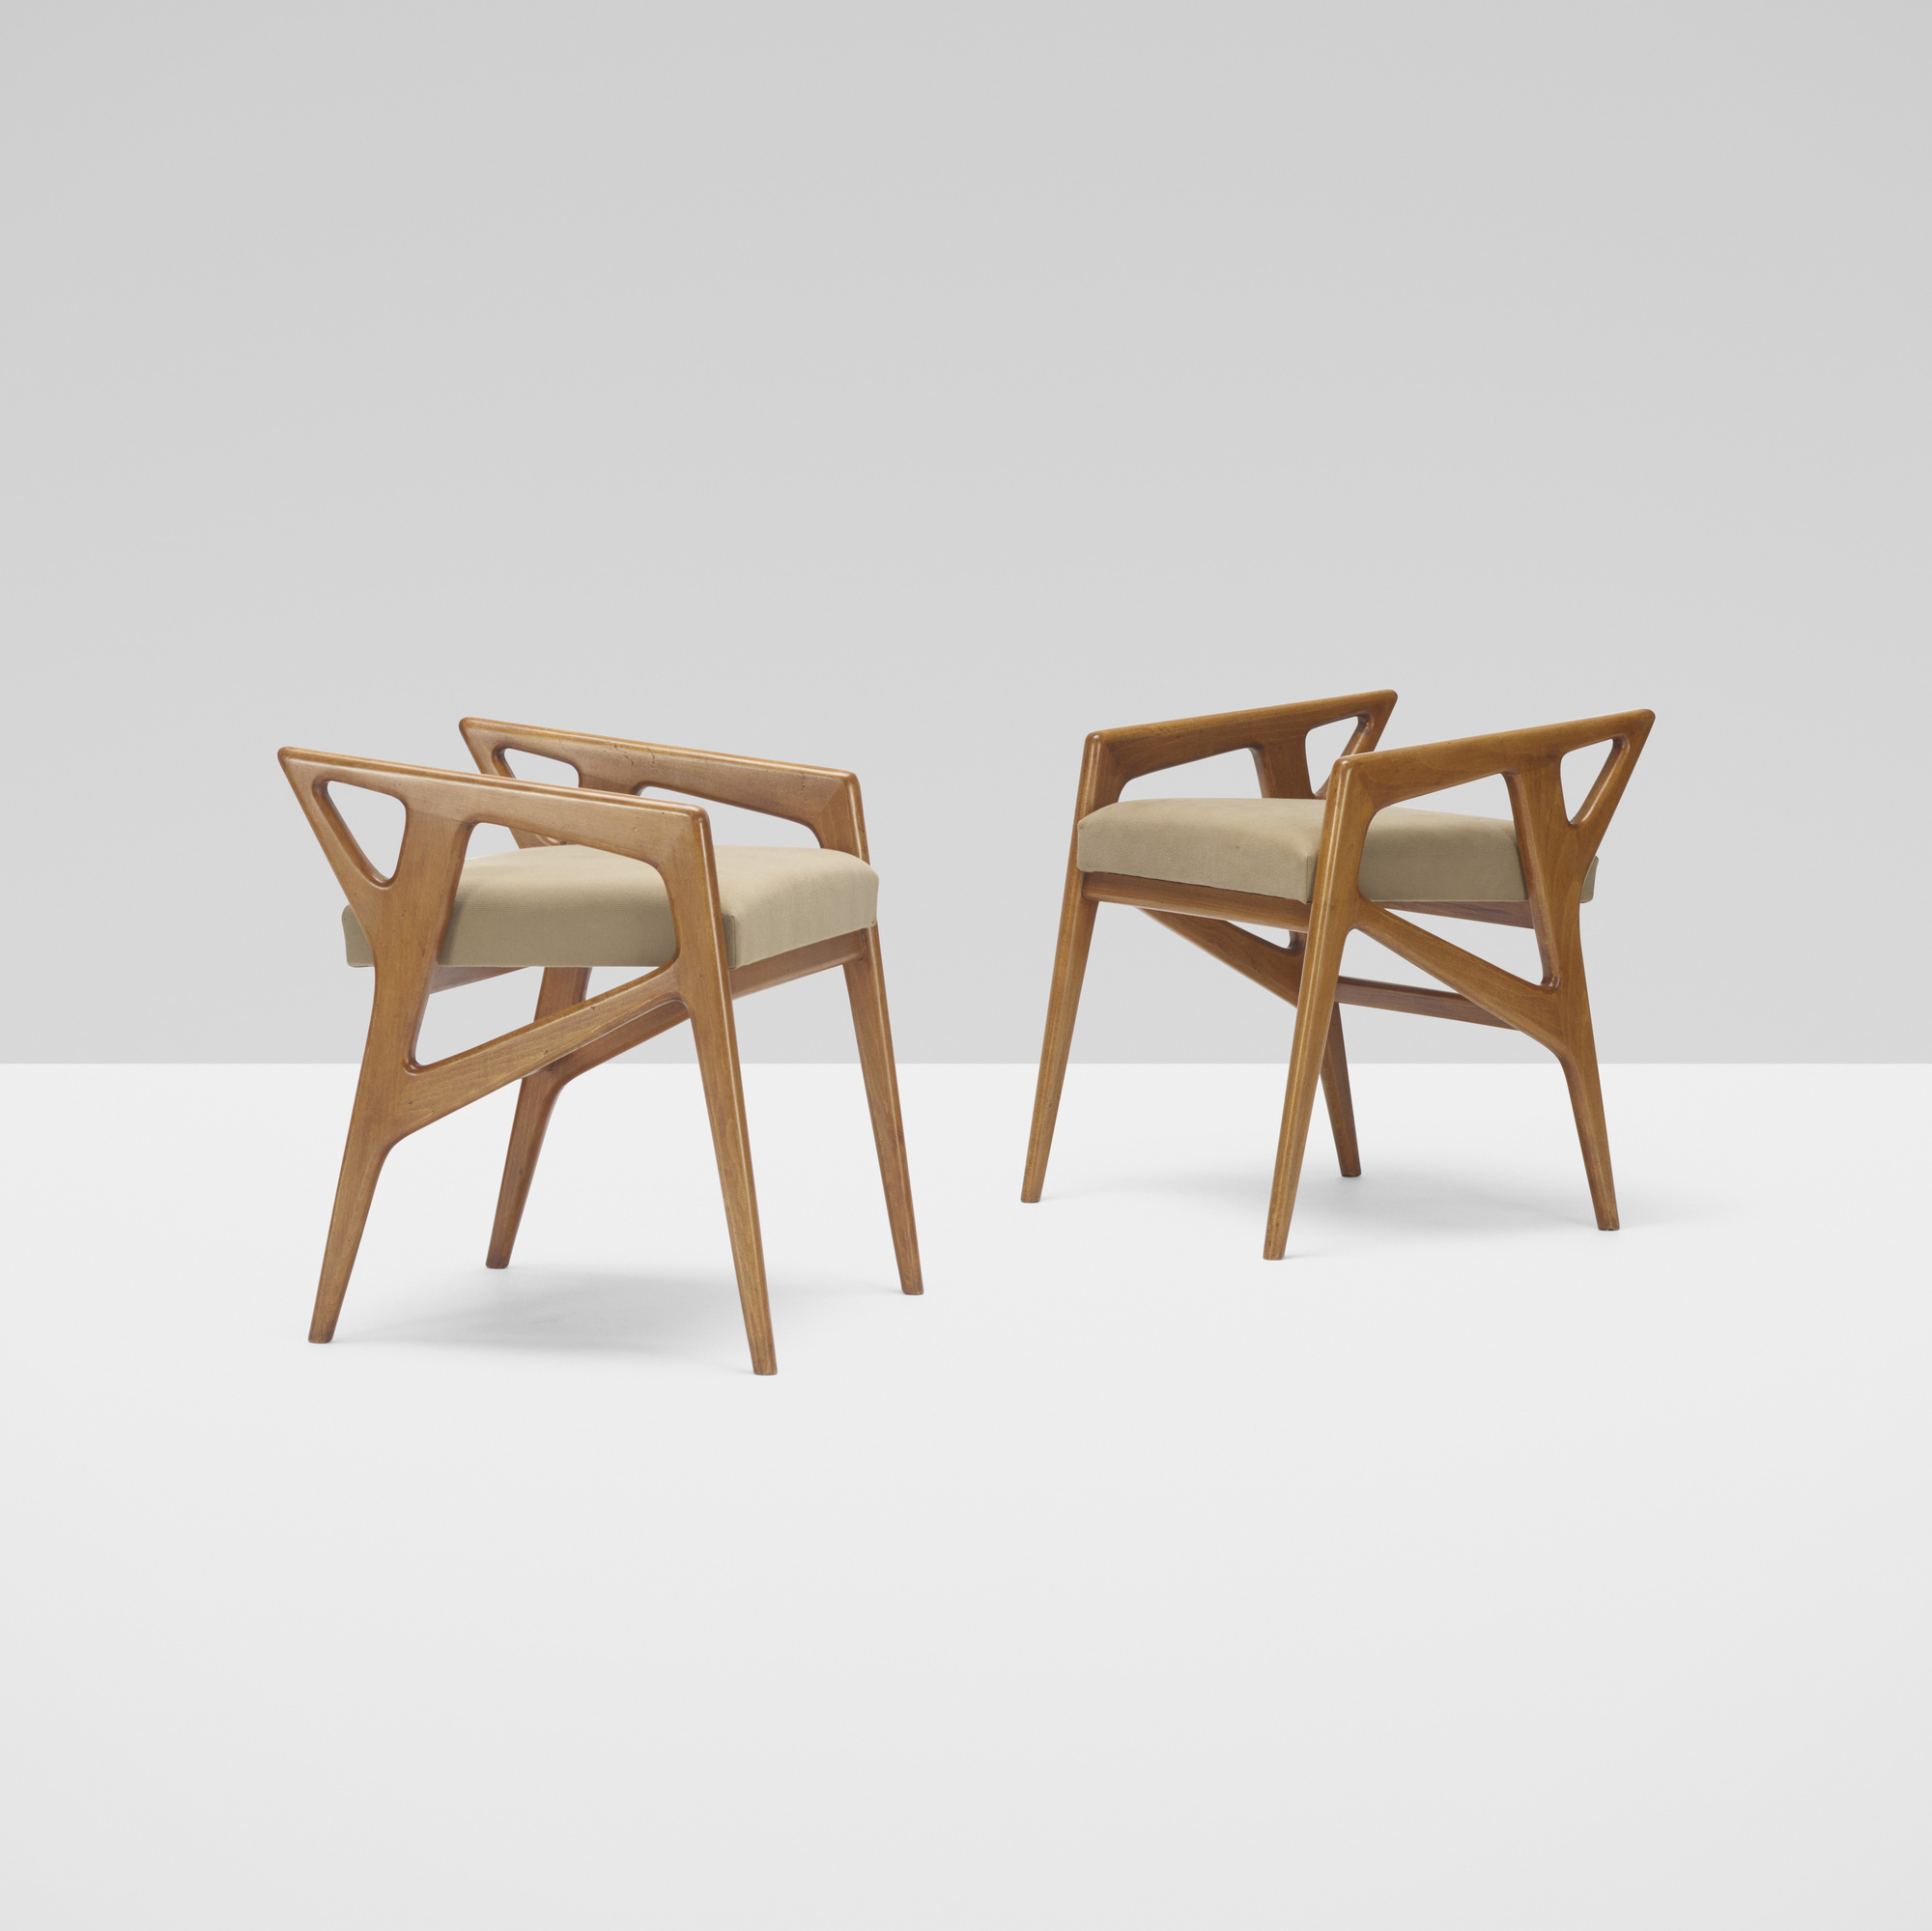 202: Gio Ponti / benches, pair (1 of 3)